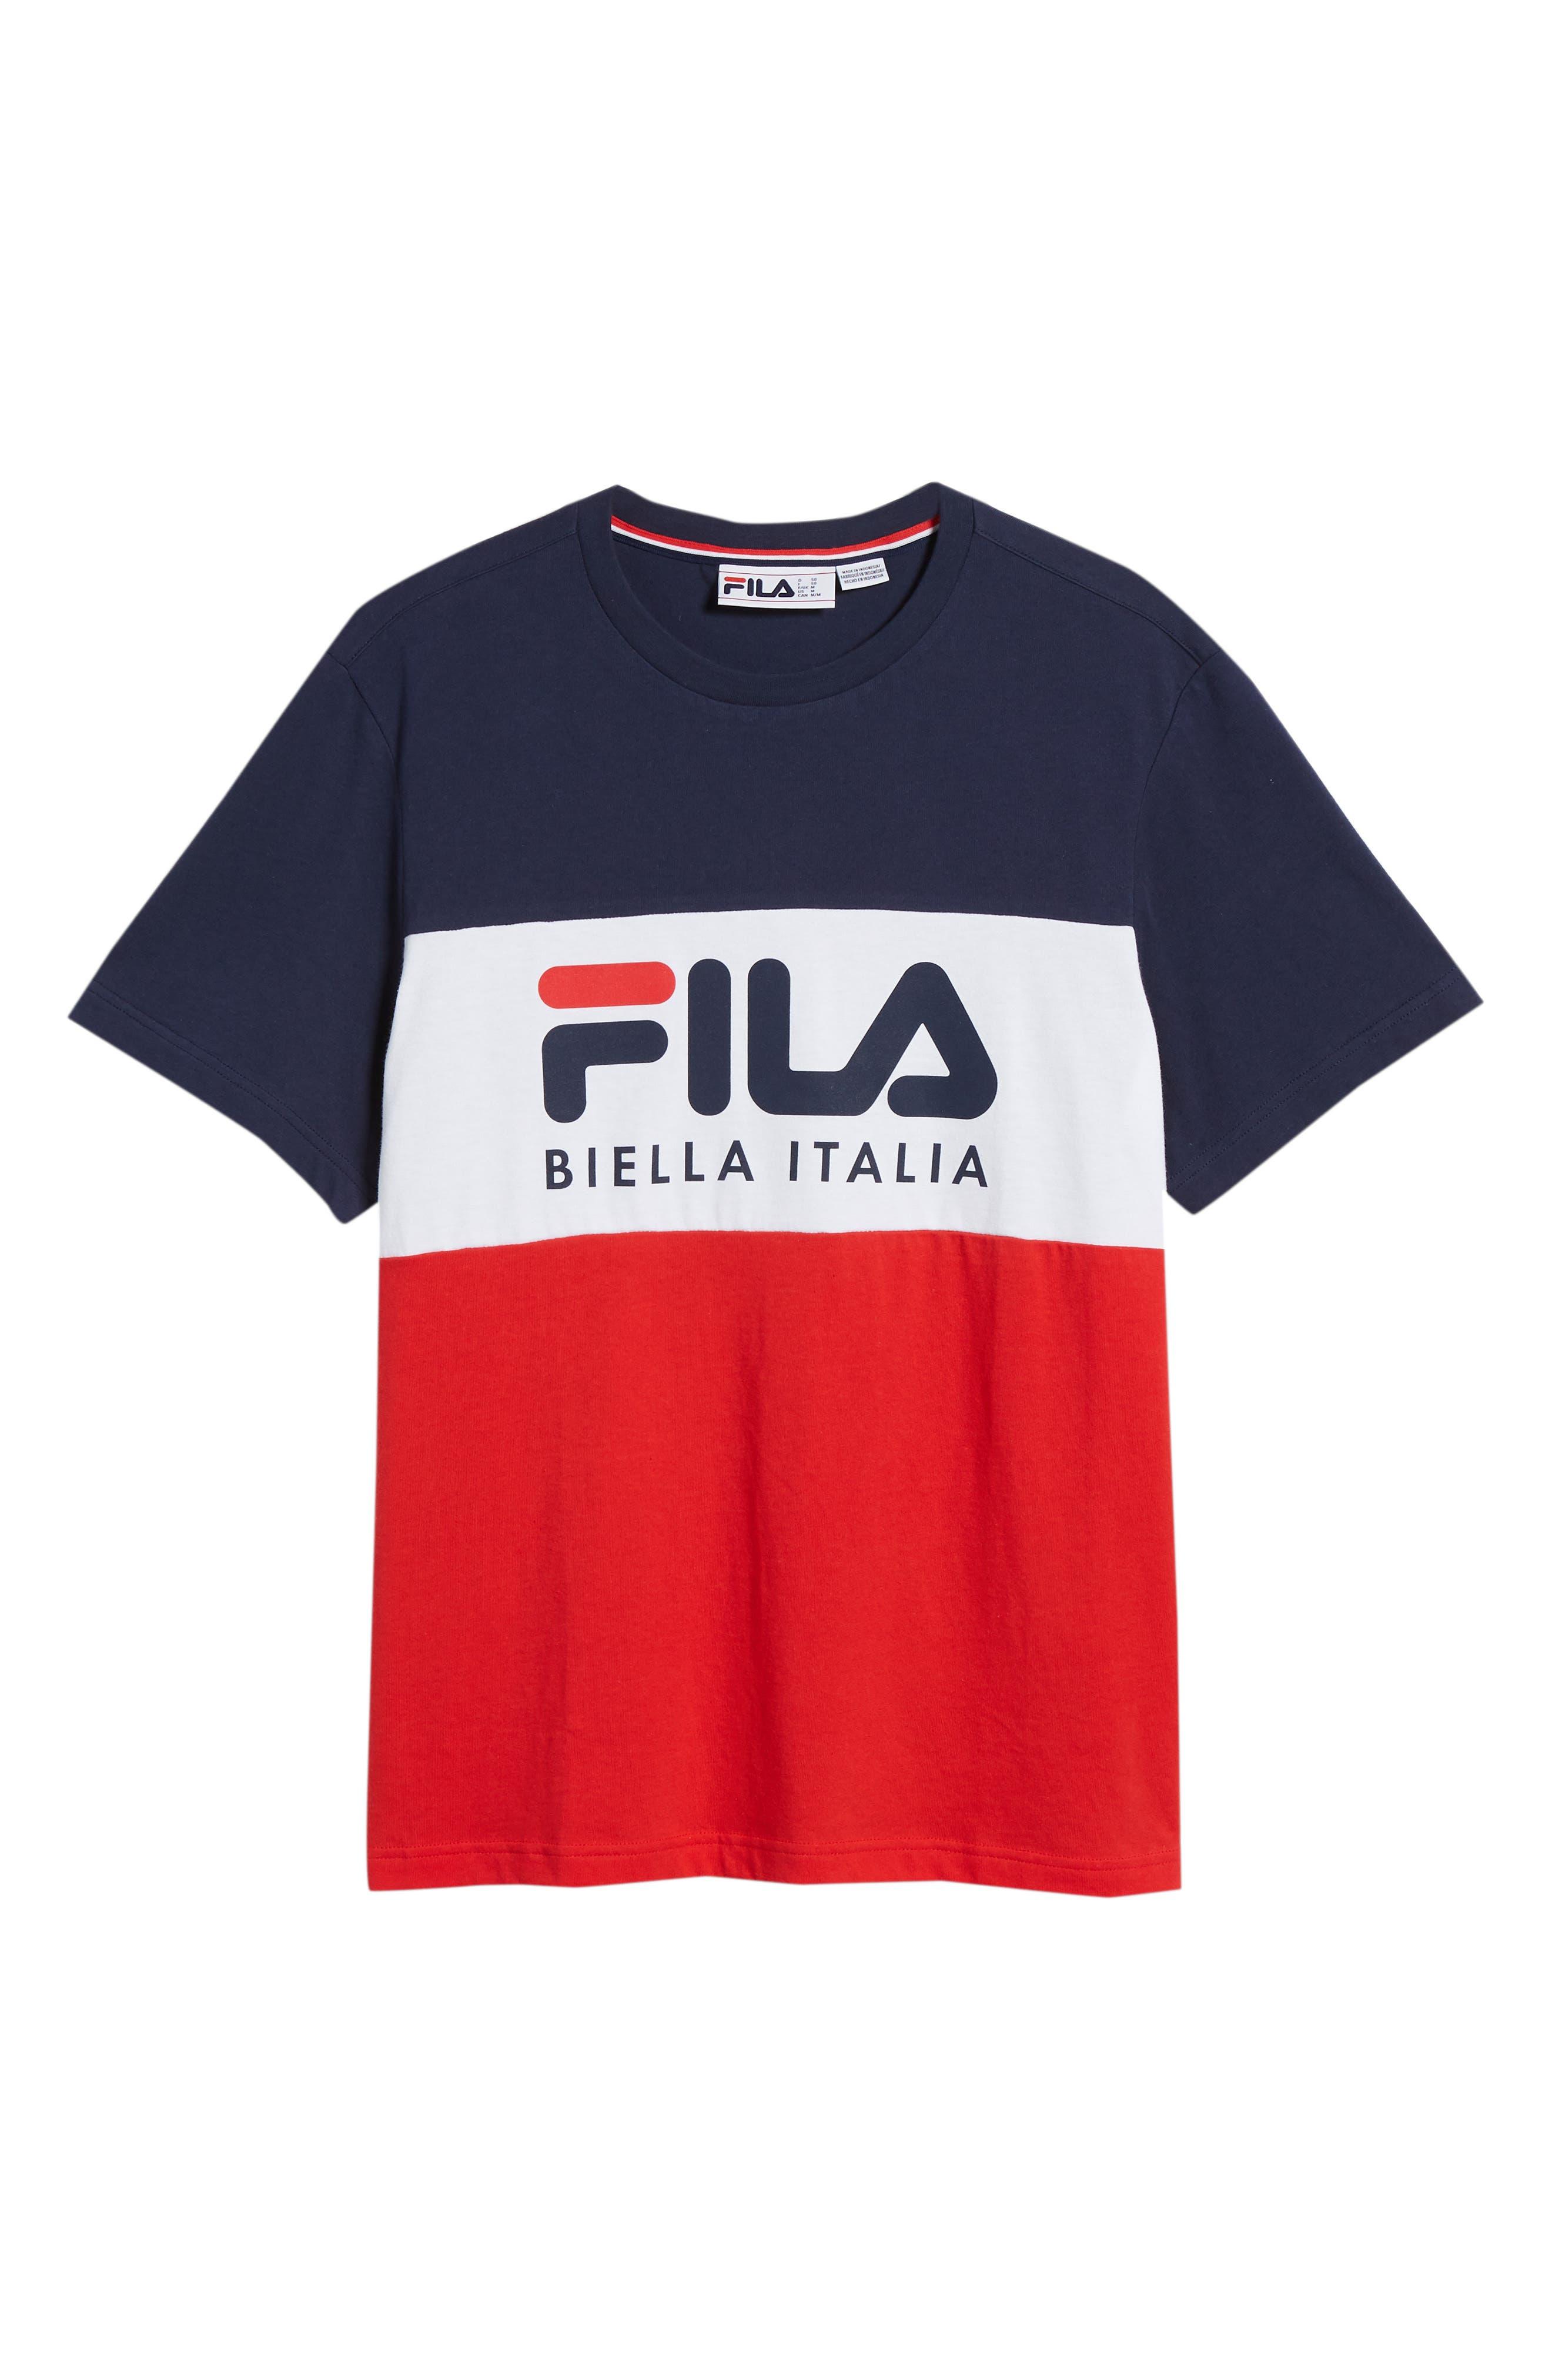 Biella Italia T-Shirt,                             Alternate thumbnail 12, color,